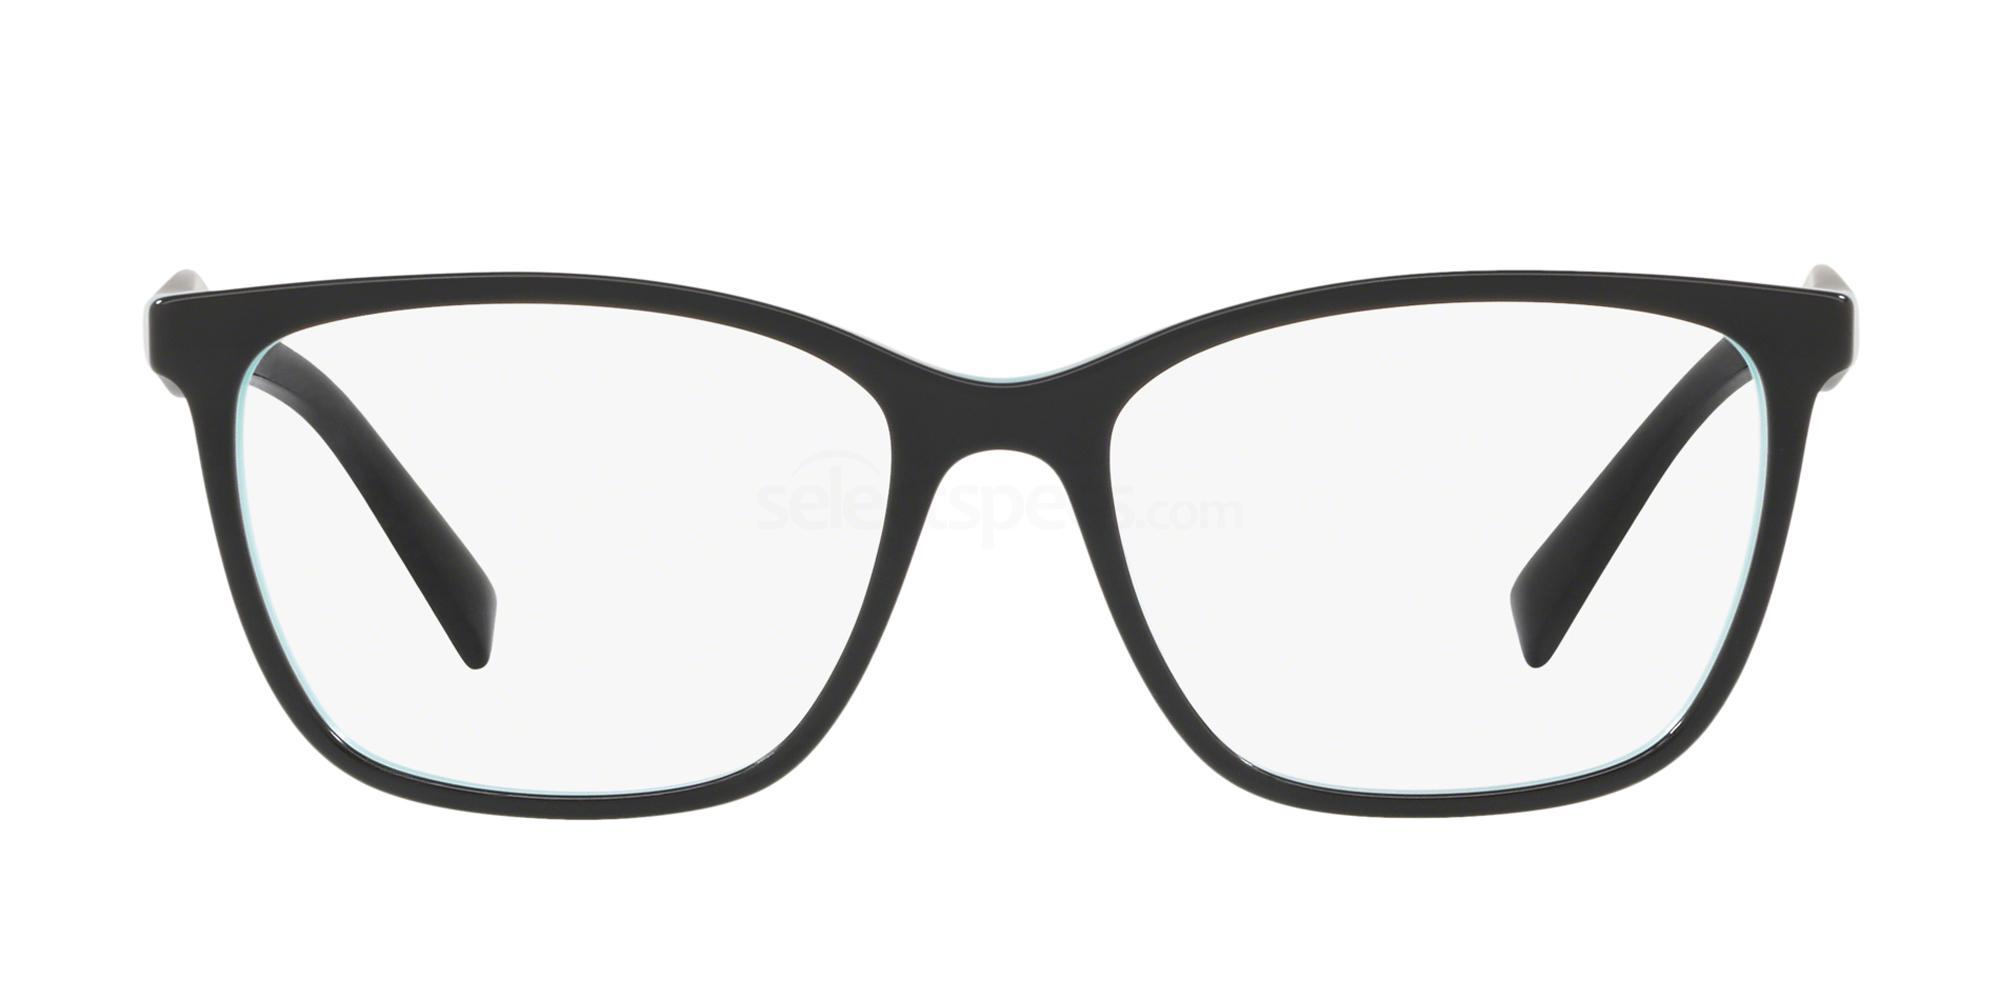 8055 TF2175 Glasses, Tiffany & Co.